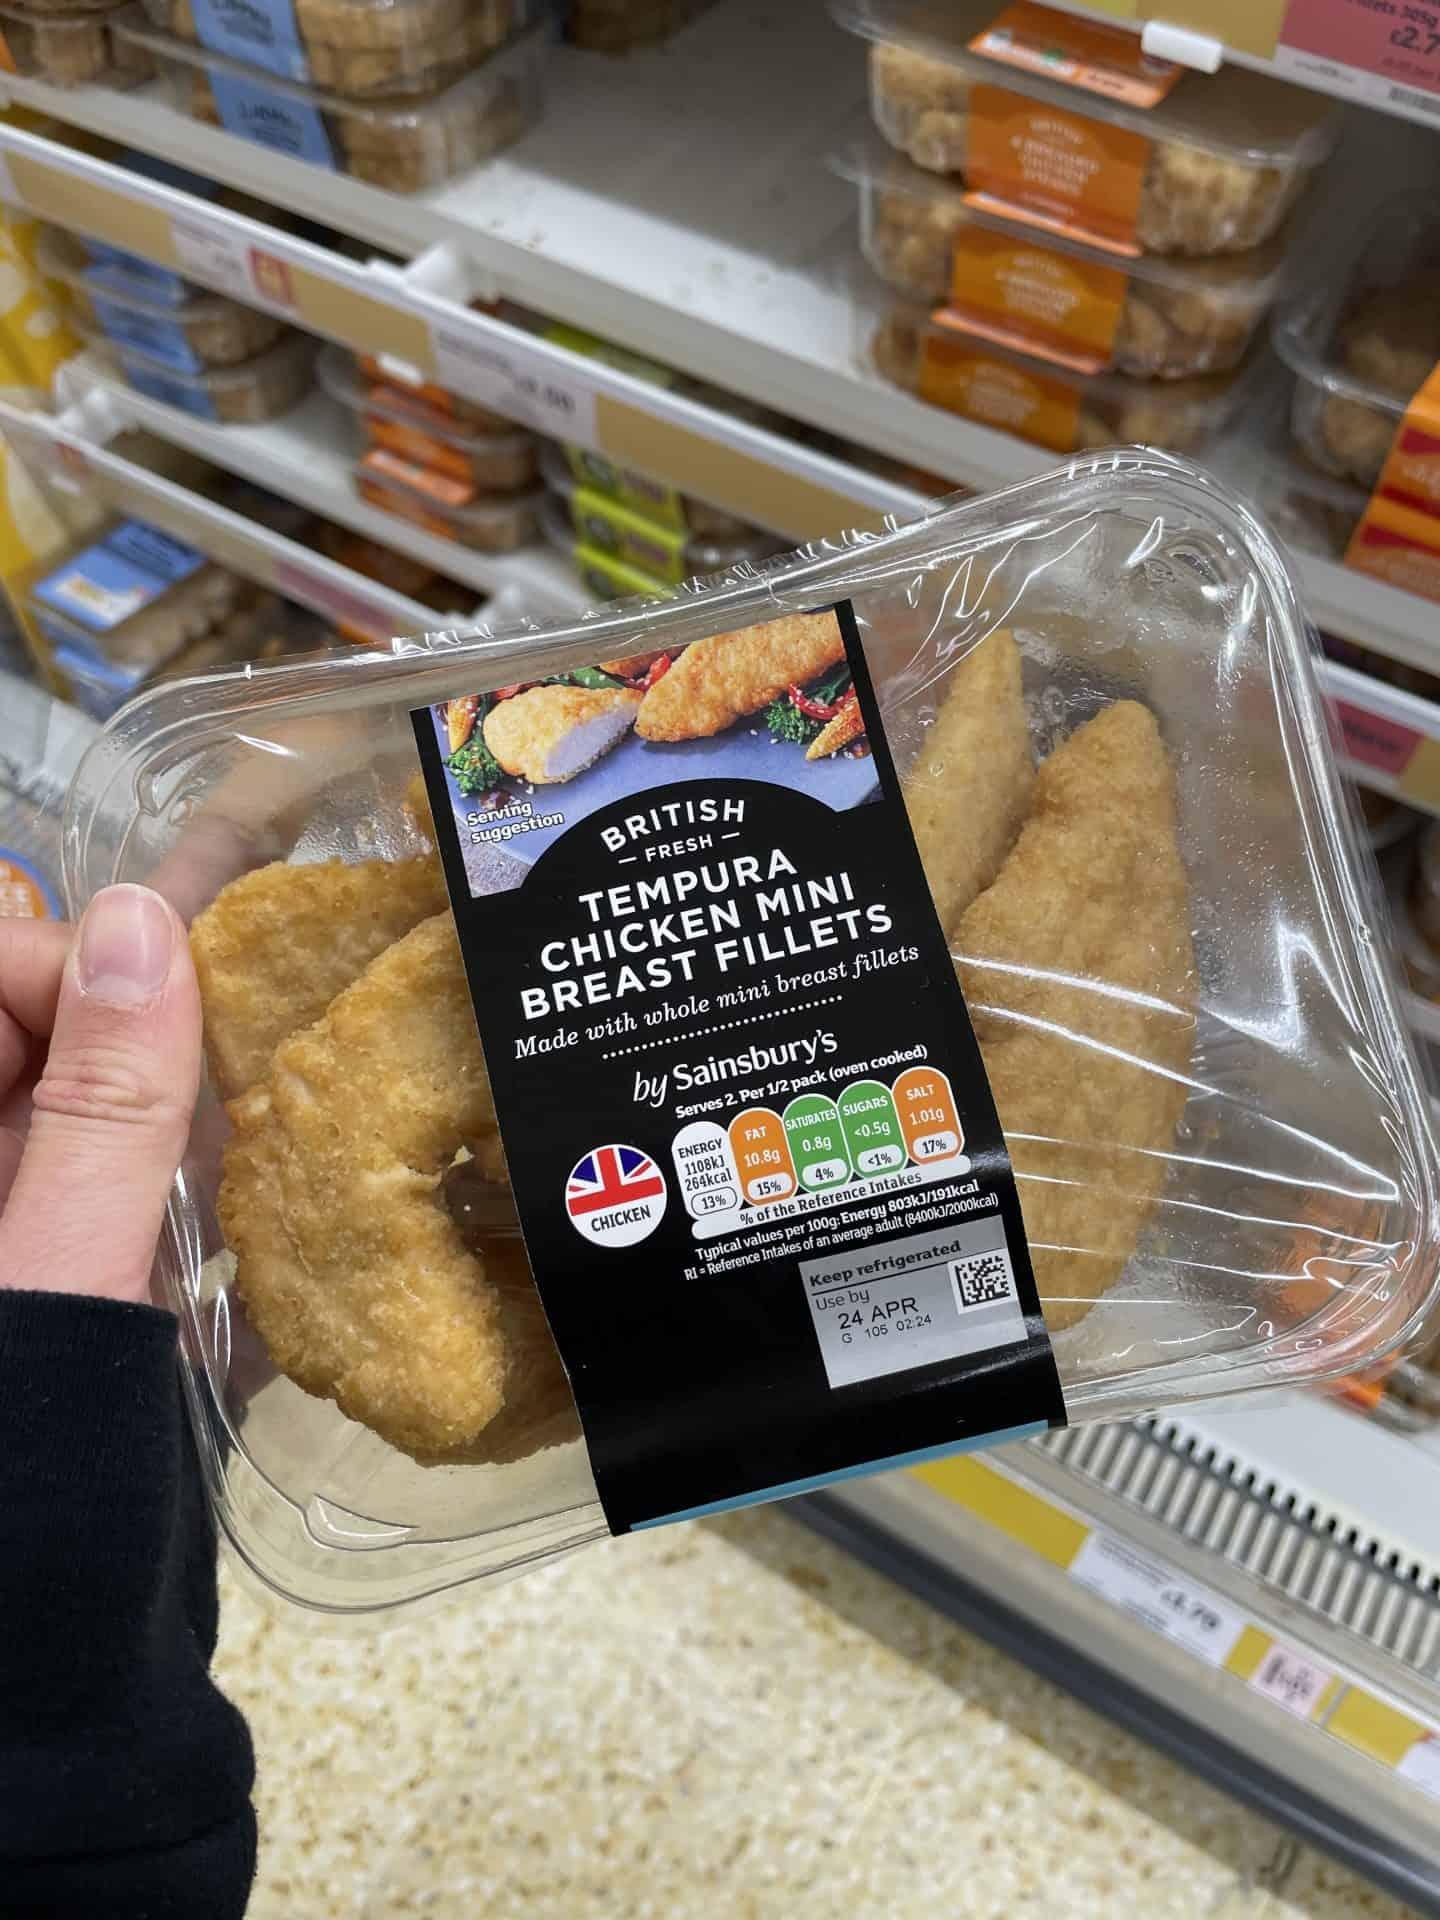 Sainsbury's tempura chicken gluten free